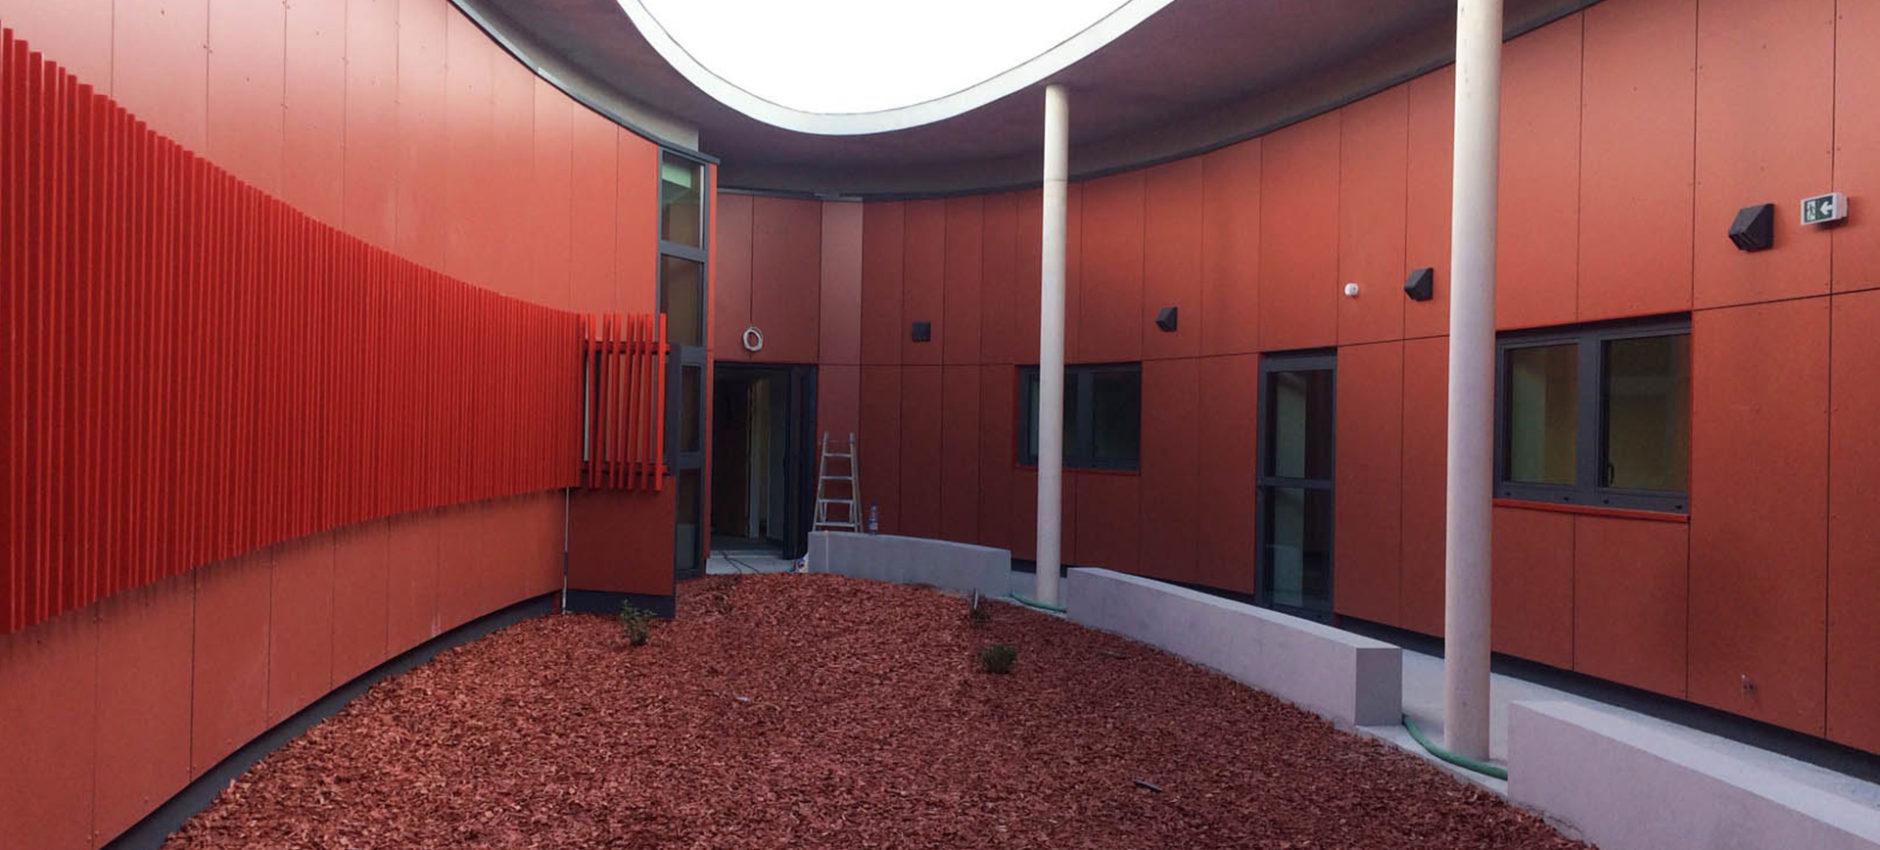 boca_architecture_projet_centre_detention_bedenac_03.jpg